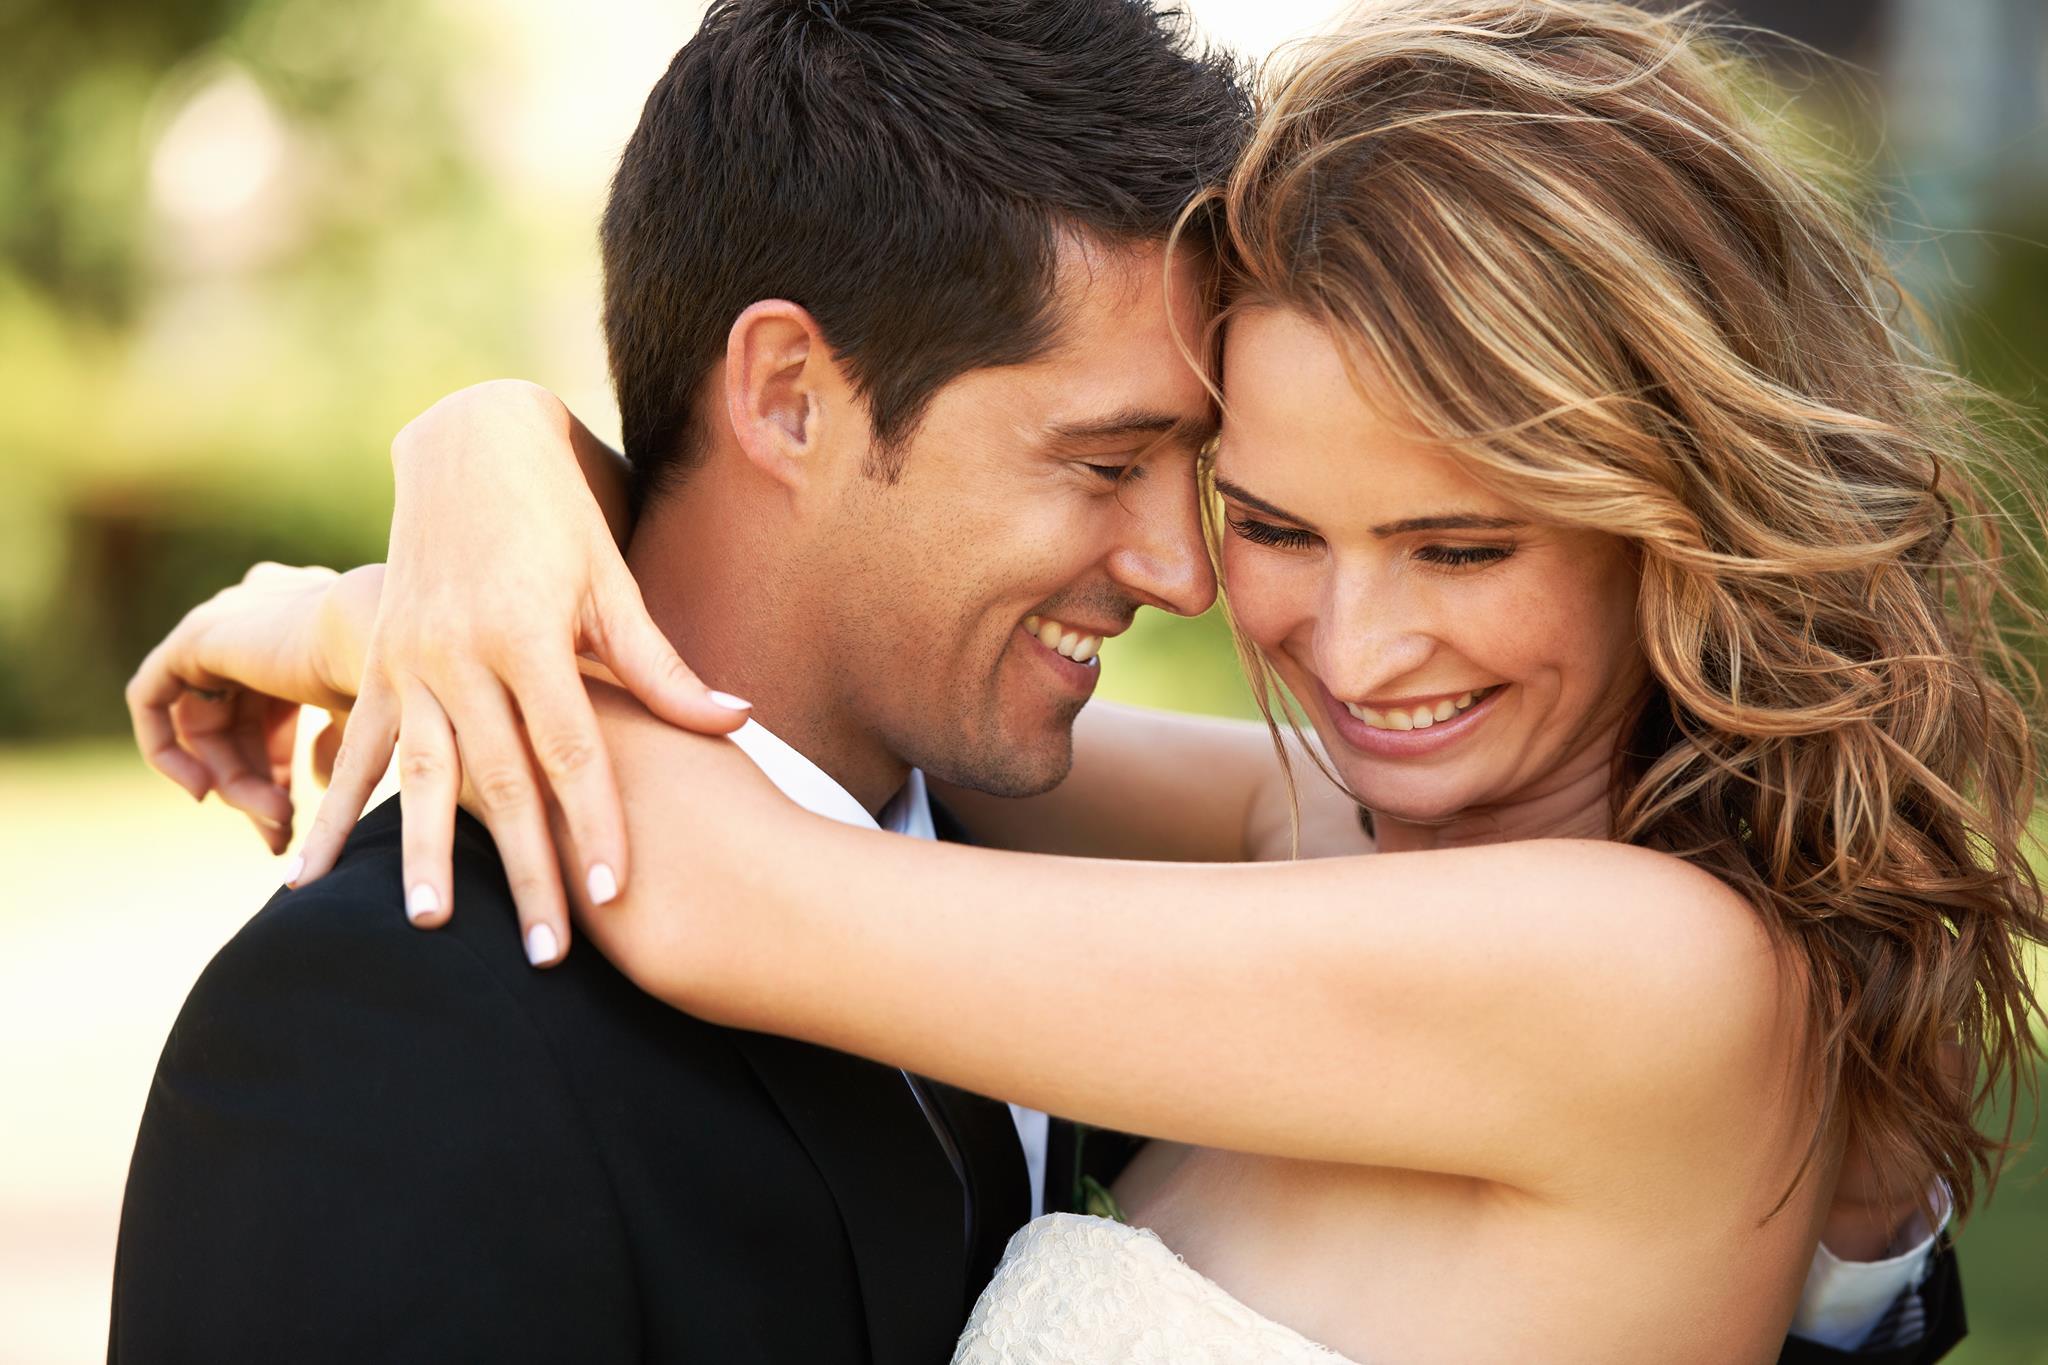 صور عريس وعروسه يوم الزفاف 8 صور عريس وعروسه يوم الزفاف